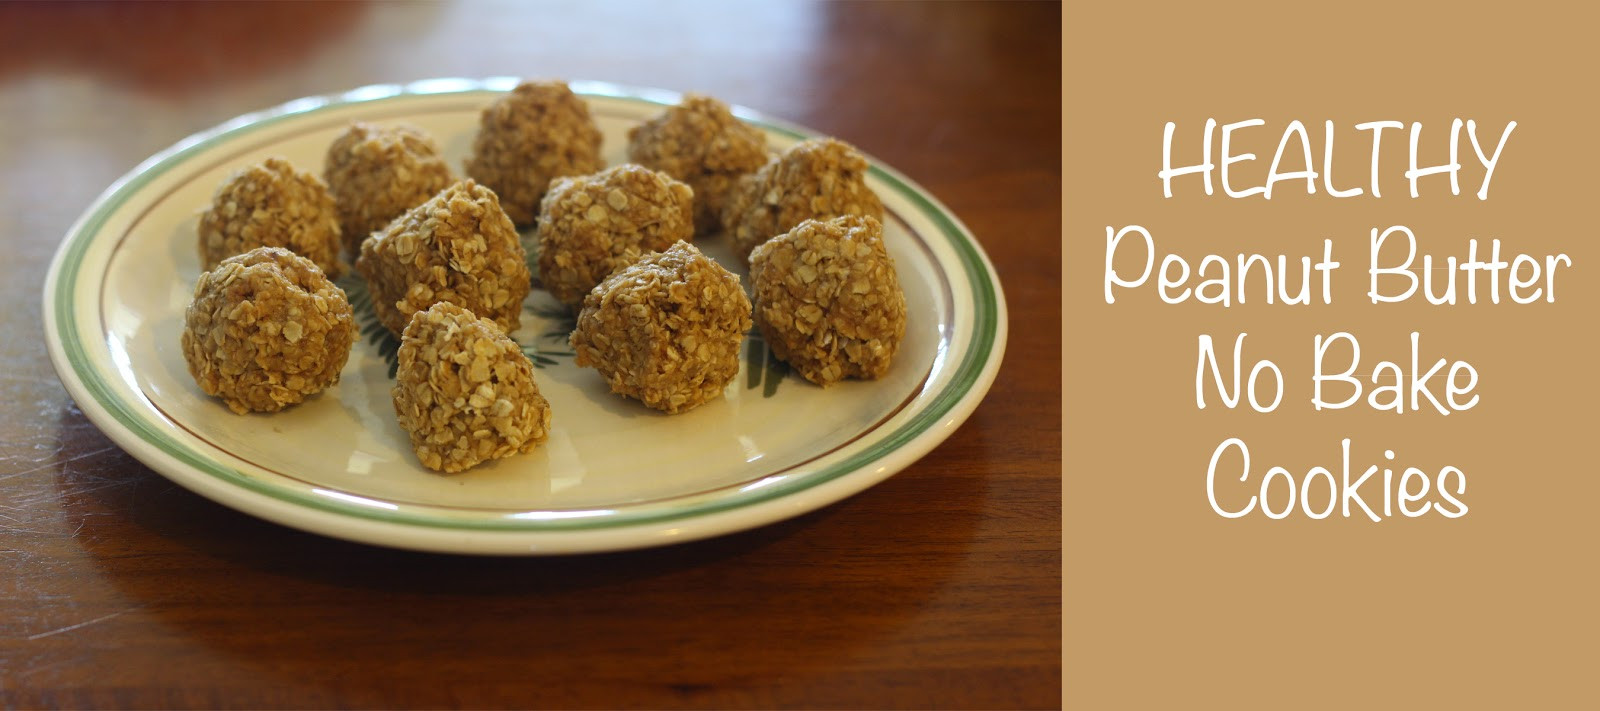 Healthy Peanut Butter No Bake Cookies  Healthy Peanut Butter No Bake Cookie Recipe Skinny Latte